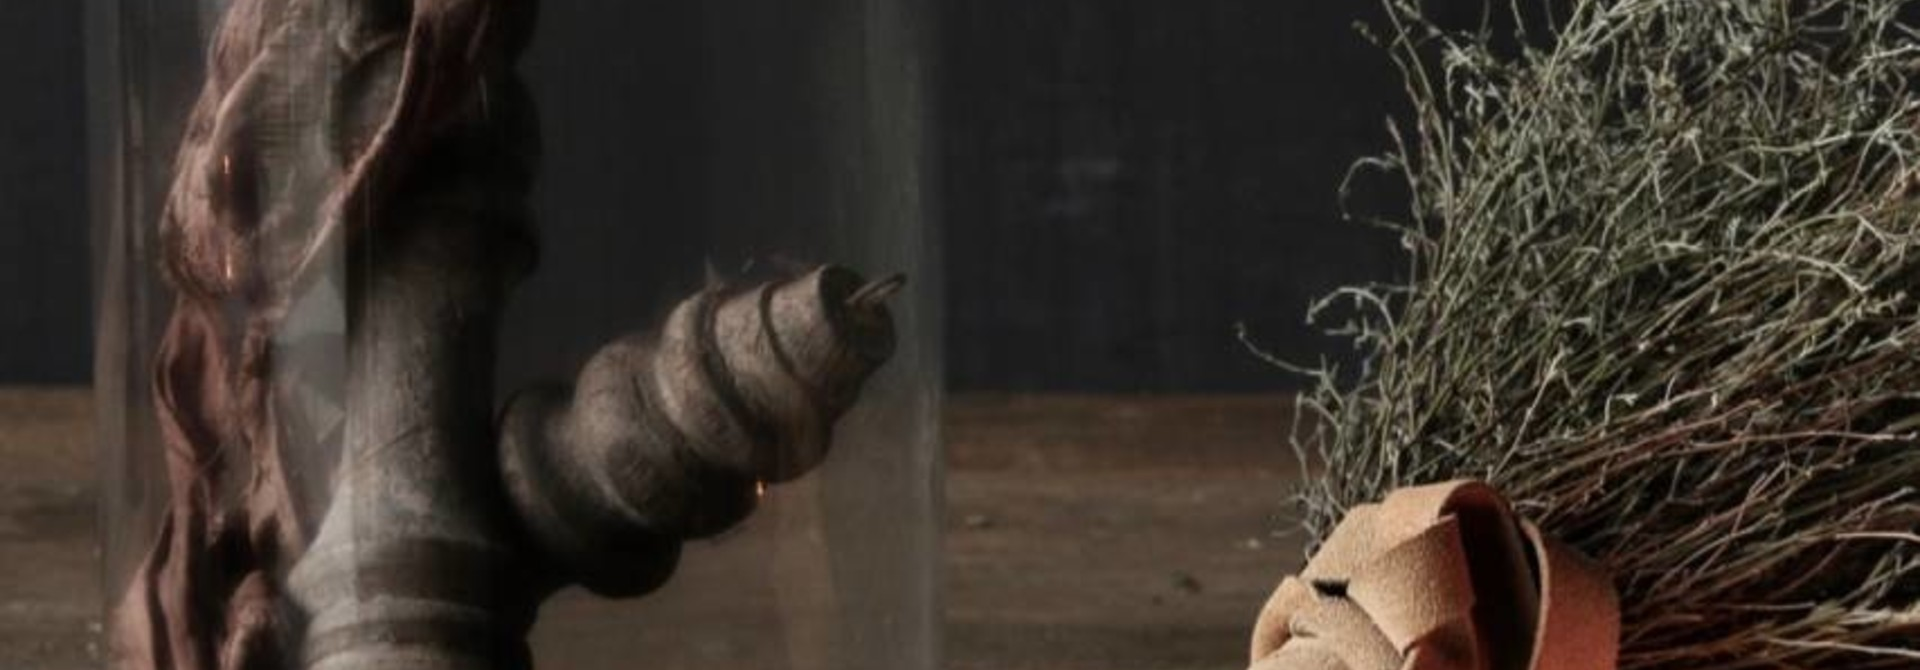 Cute little bell jar on brown wooden base